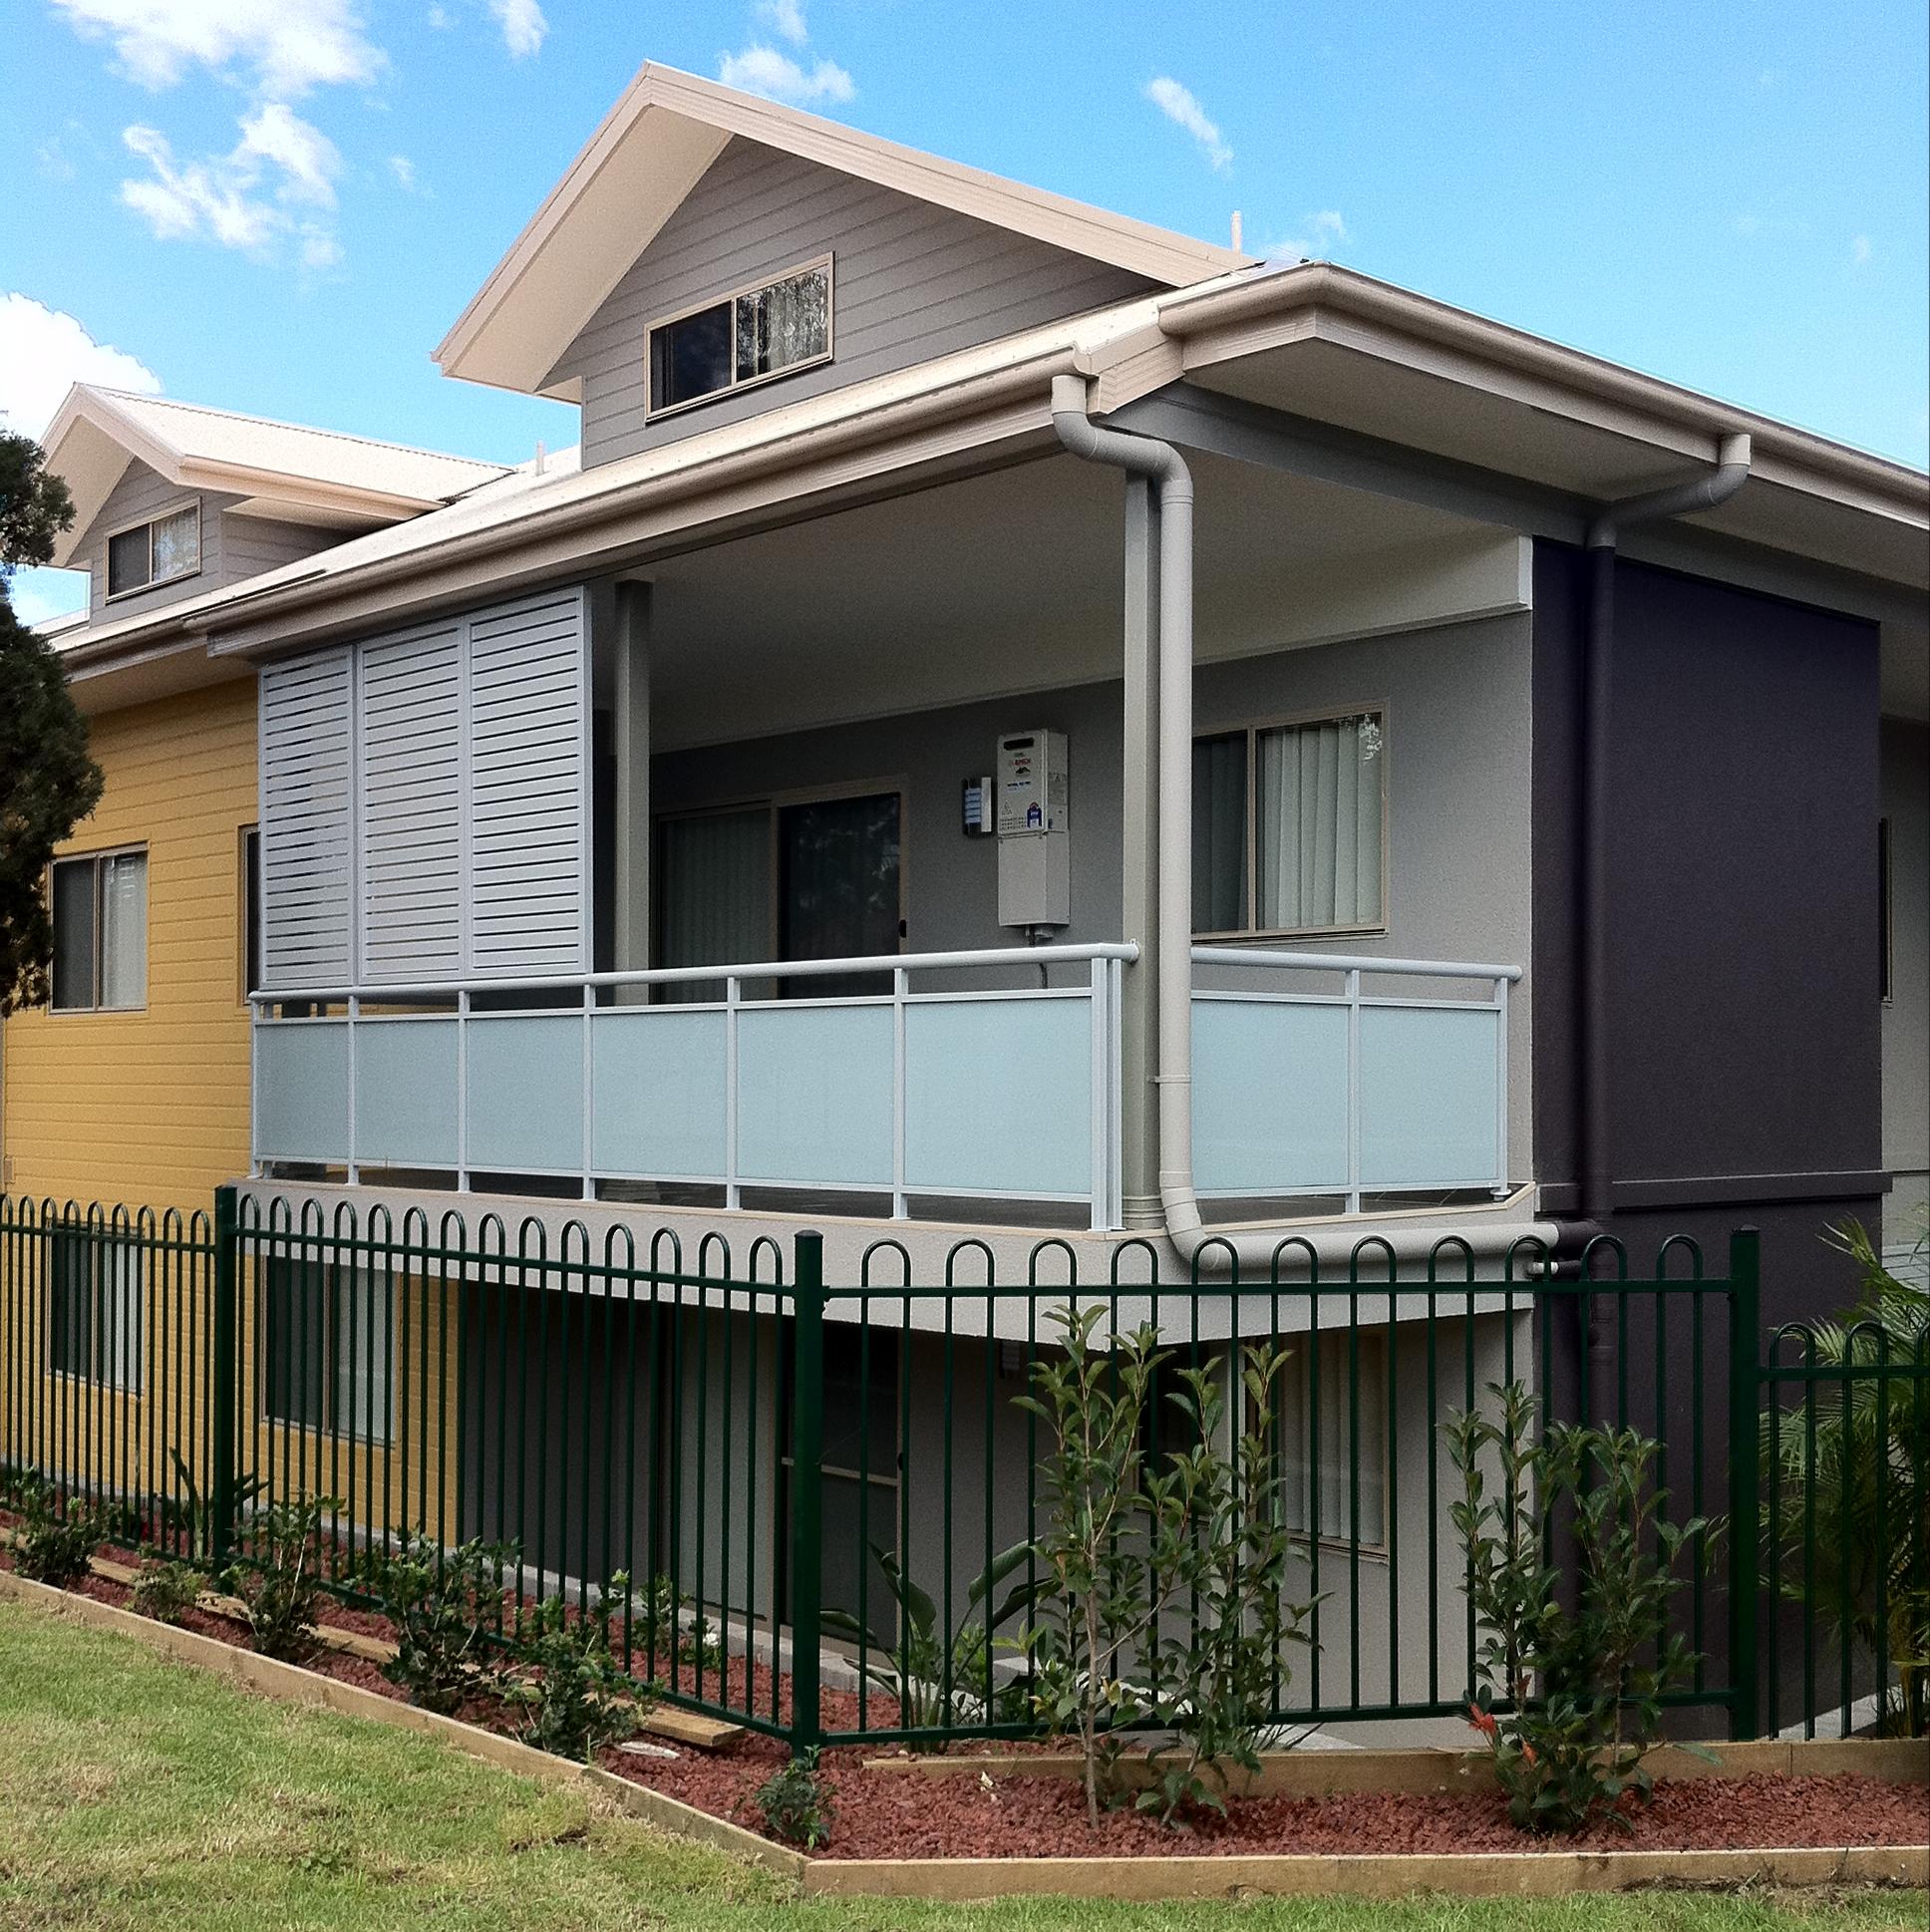 4/8 Colless St, Penrith NSW 2750, Australia , Apartment